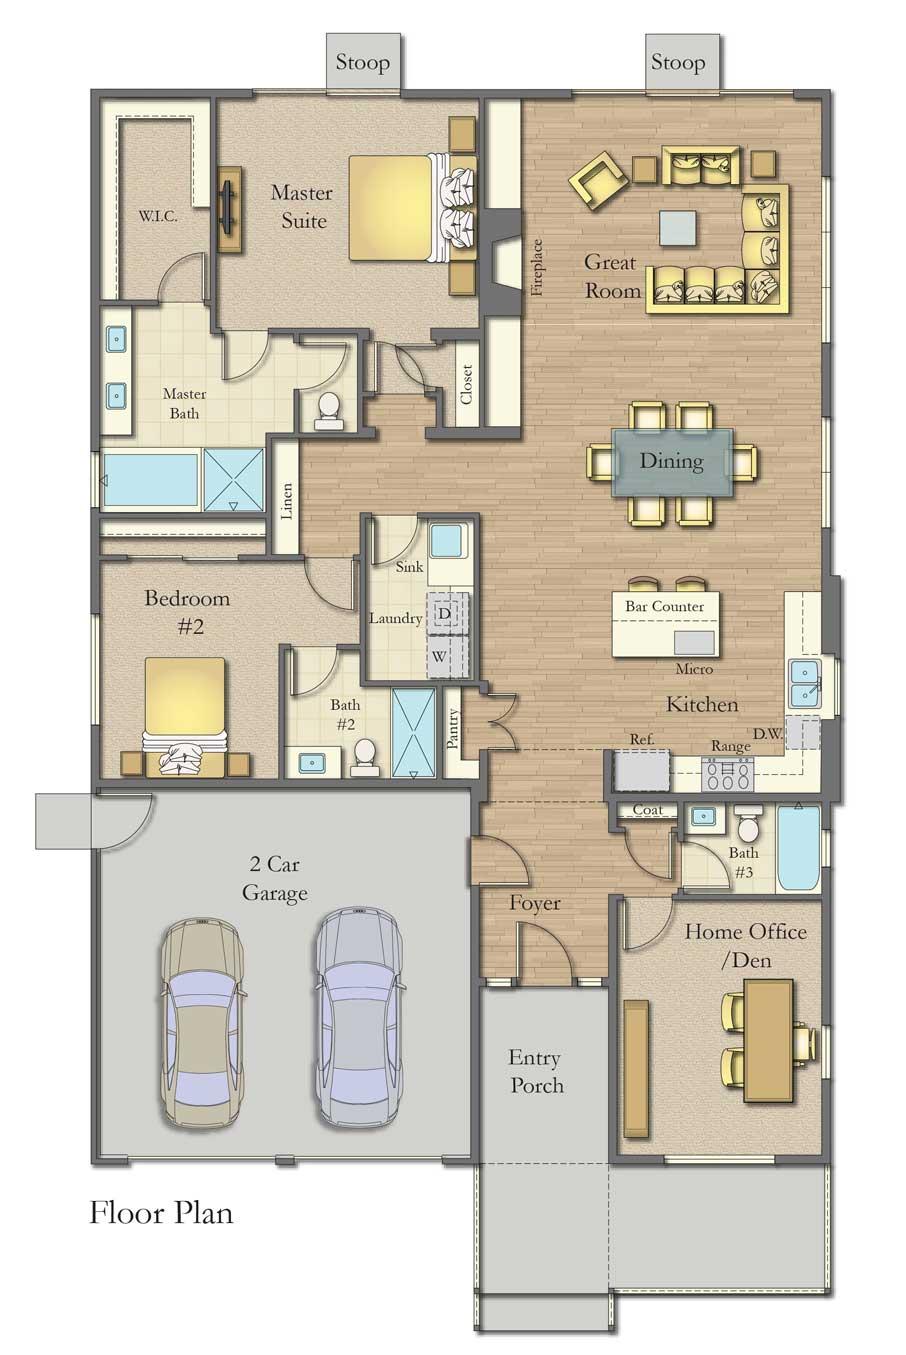 Plan A Floor Plan, Bordeaux Oaks, Napa